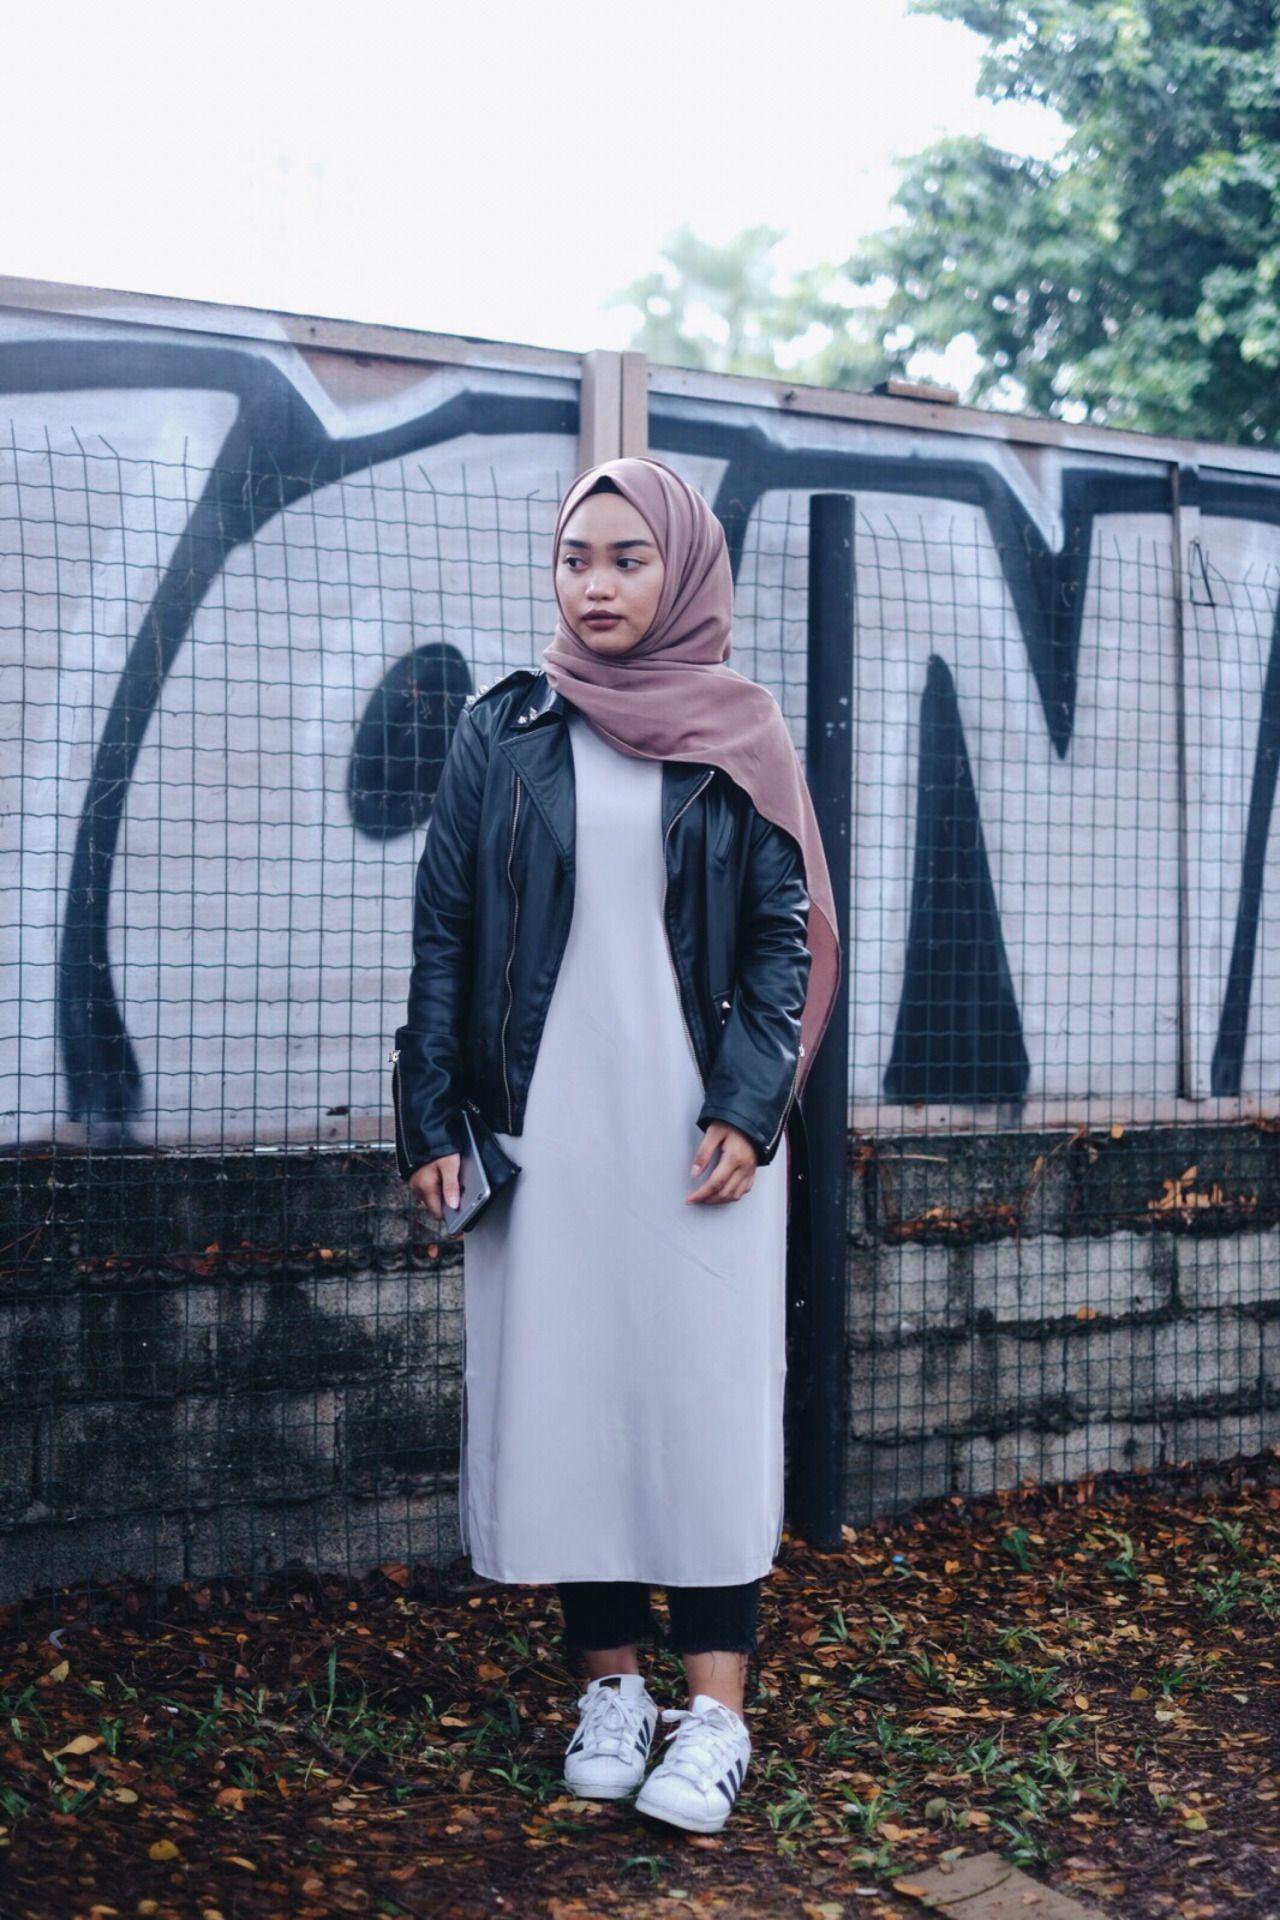 Leather jacket hijab - Hijabfashion Leather Jacket Midi Dress Adidas Superstar Trainers